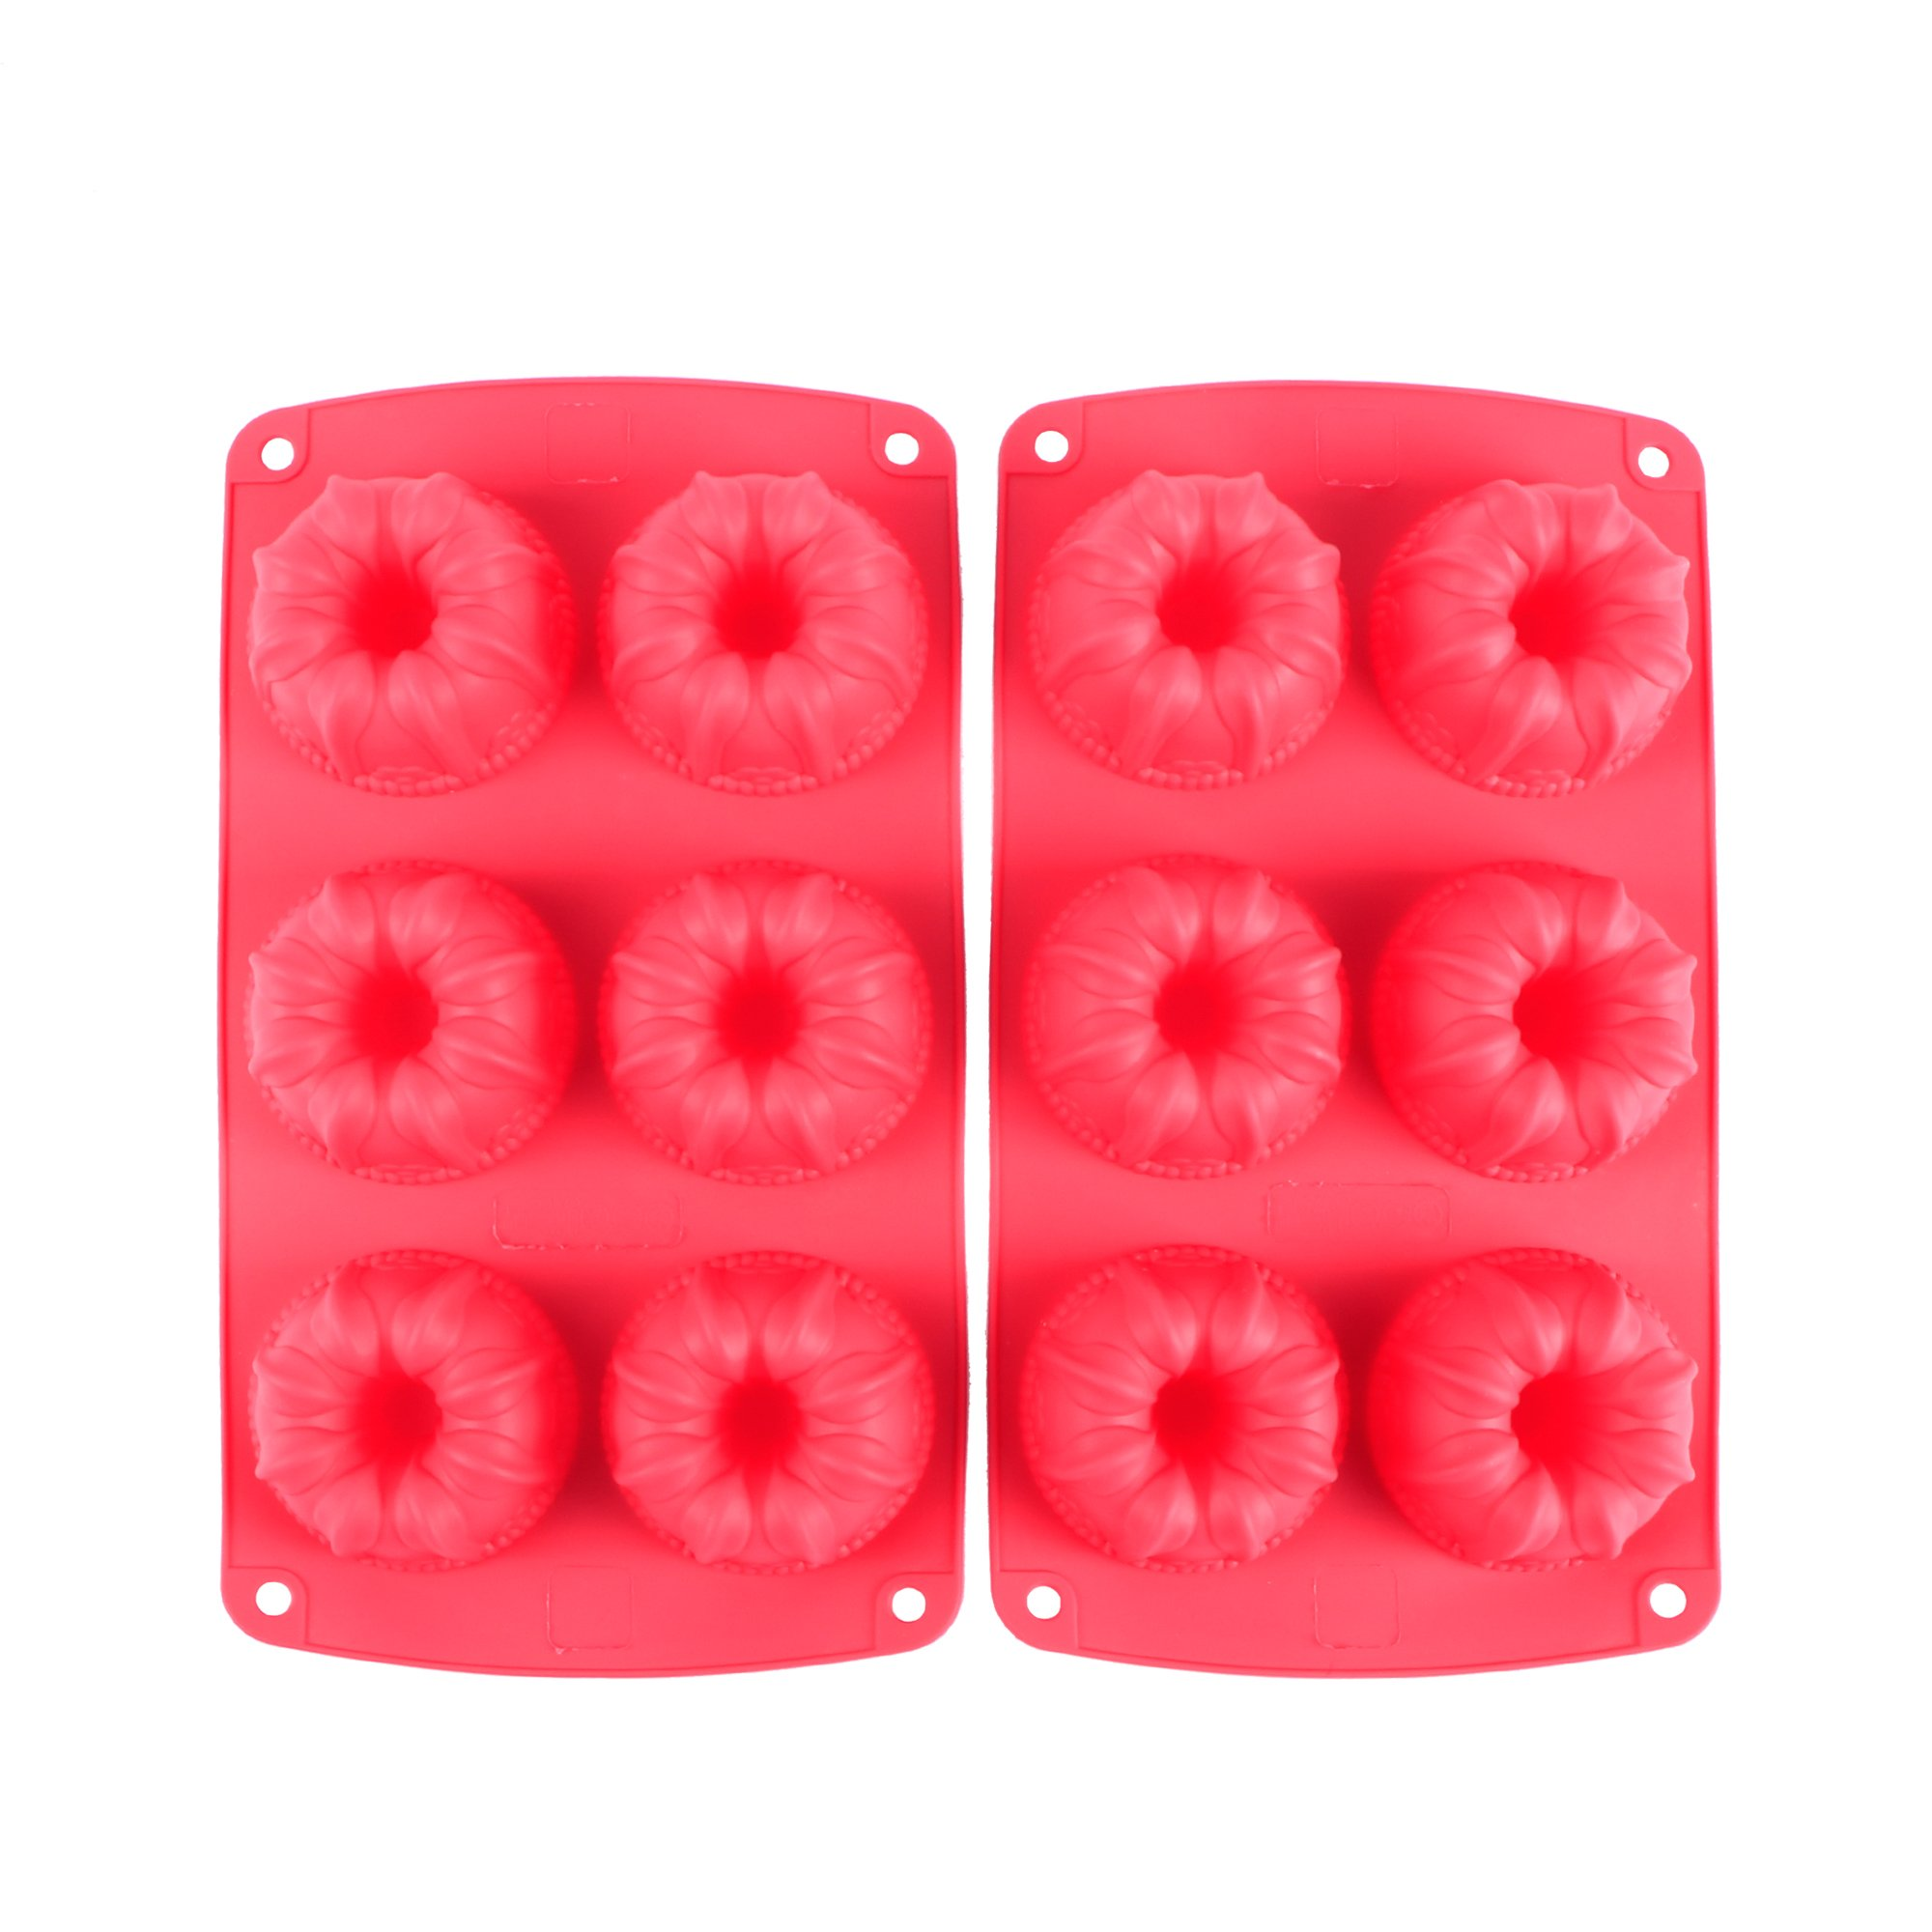 Webake 6-Cavity Silicone Fancy Bundt Cake Muffin Cupcake Mold,Set of 2